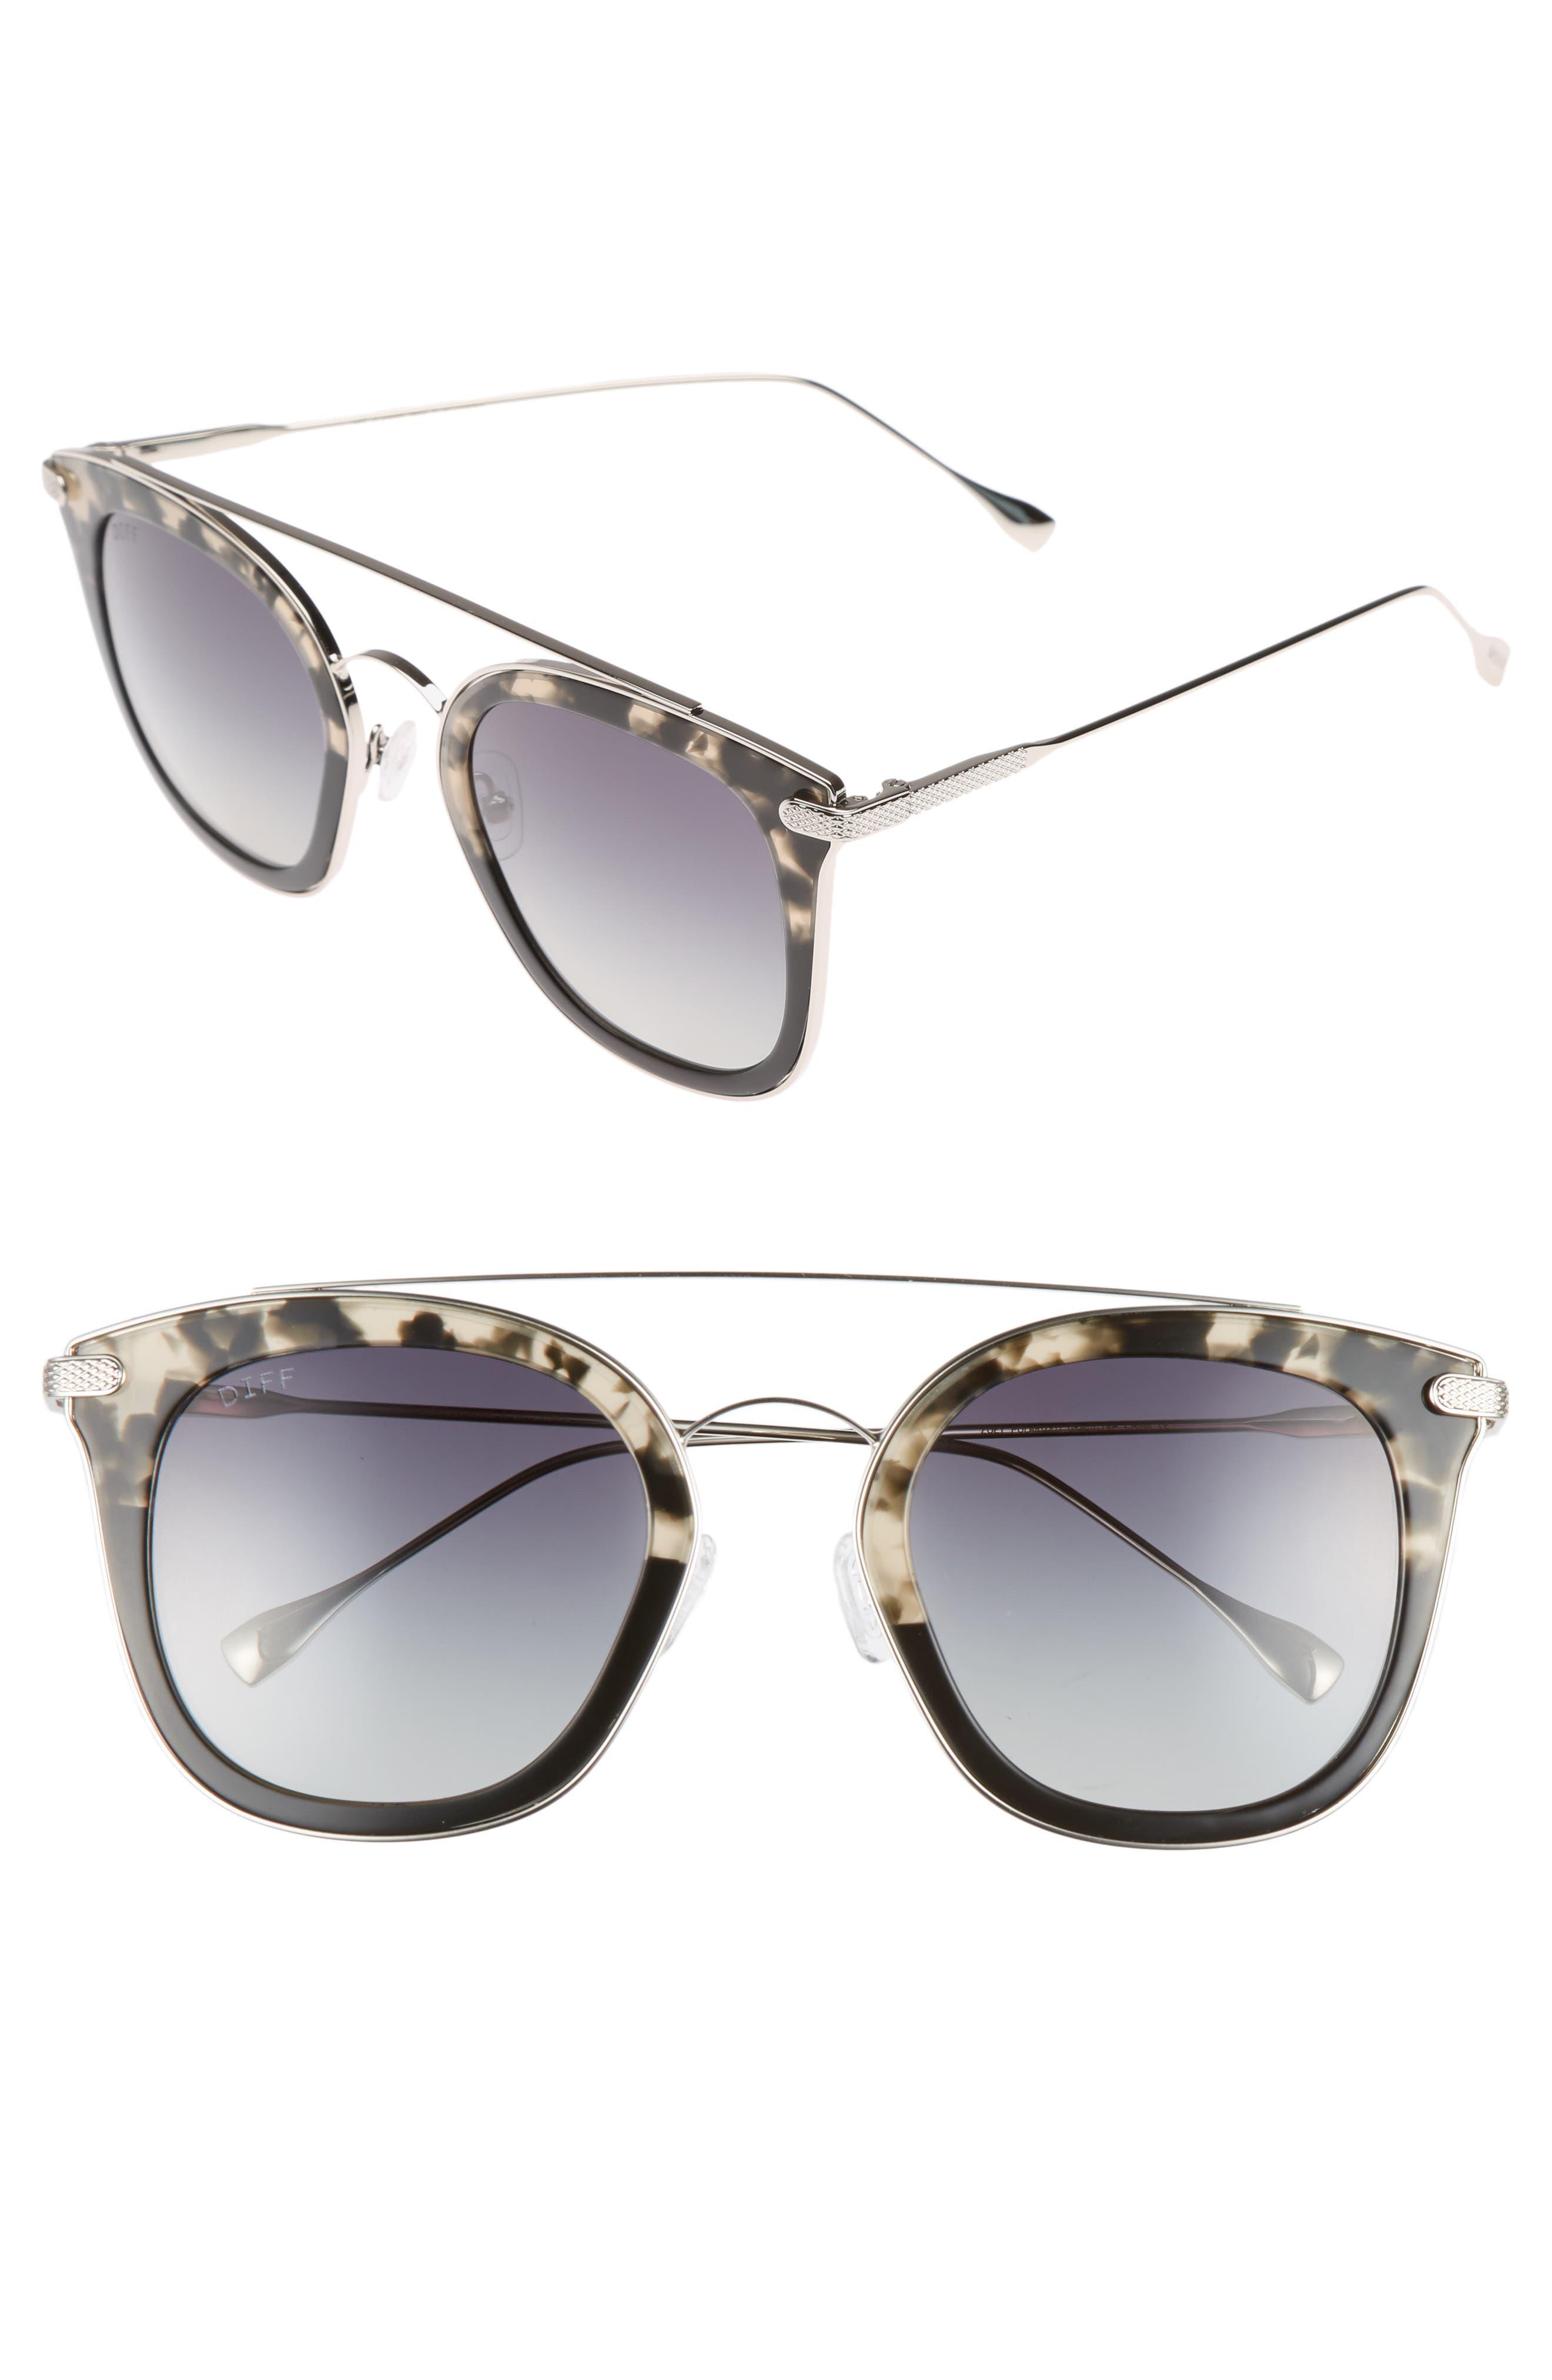 DIFF Zoey 51mm Polarized Sunglasses